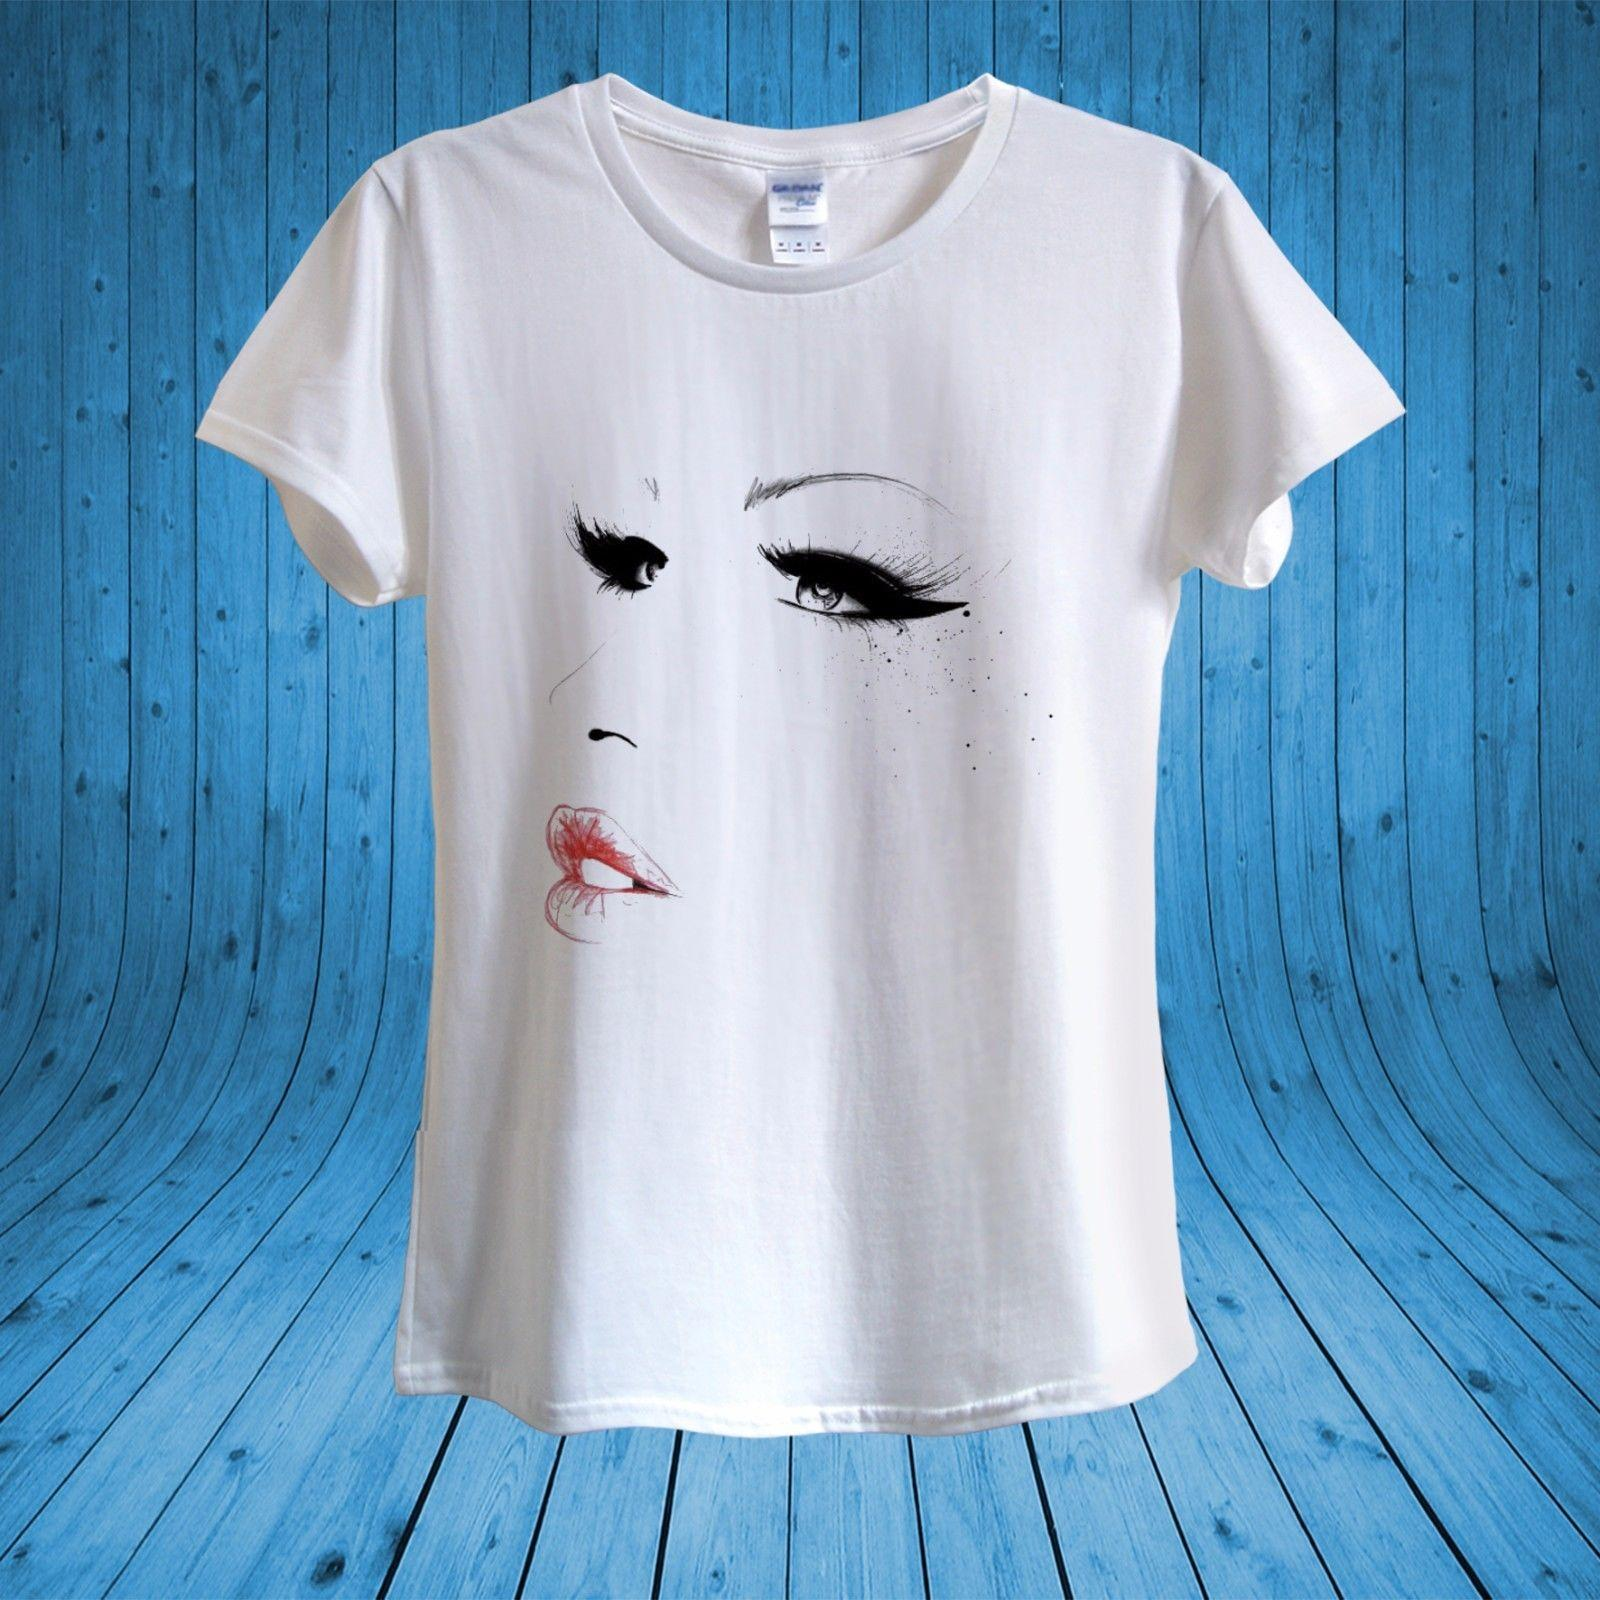 c74d45d3c465 Details zu Girl Face Smokey Eyes Eyelashes Lips Make-up T-shirt 100% cotton  unisex women Casual Funny free shipping Unisex tee gift